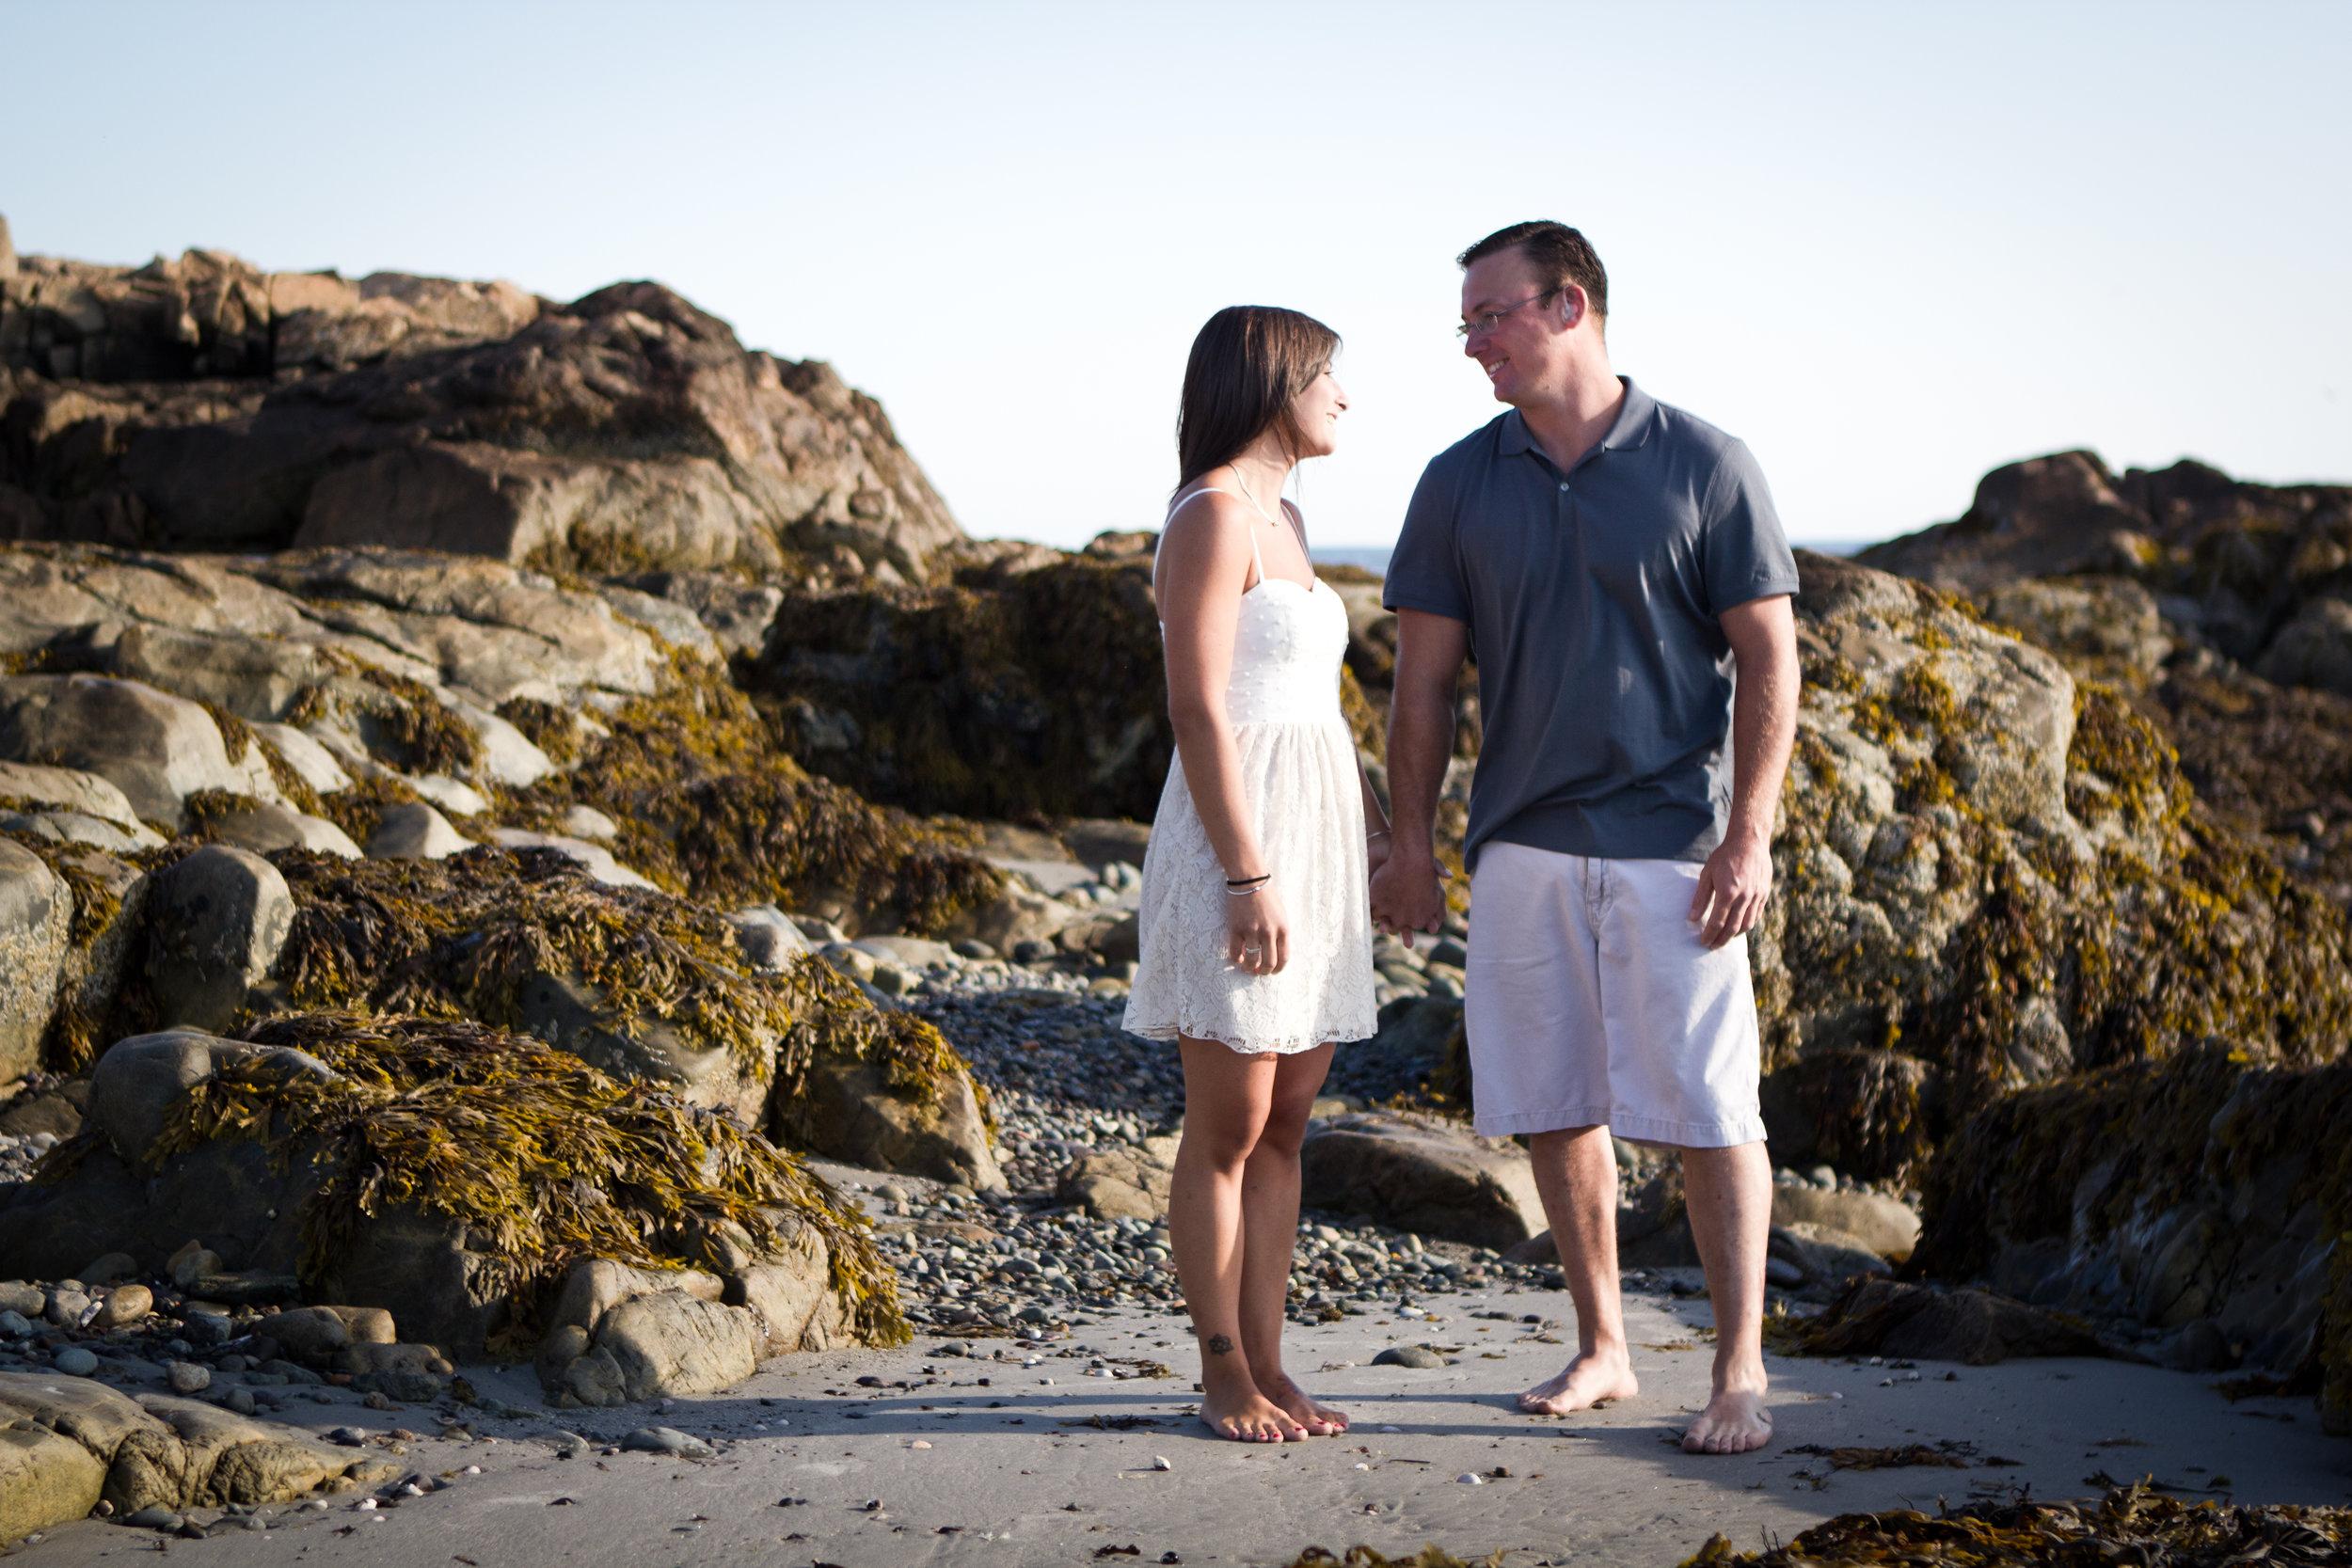 Erin and Mike Sandy Beach Cohasset South Shore Massachusetts Engagement Photographer Shannon Sorensen Photography